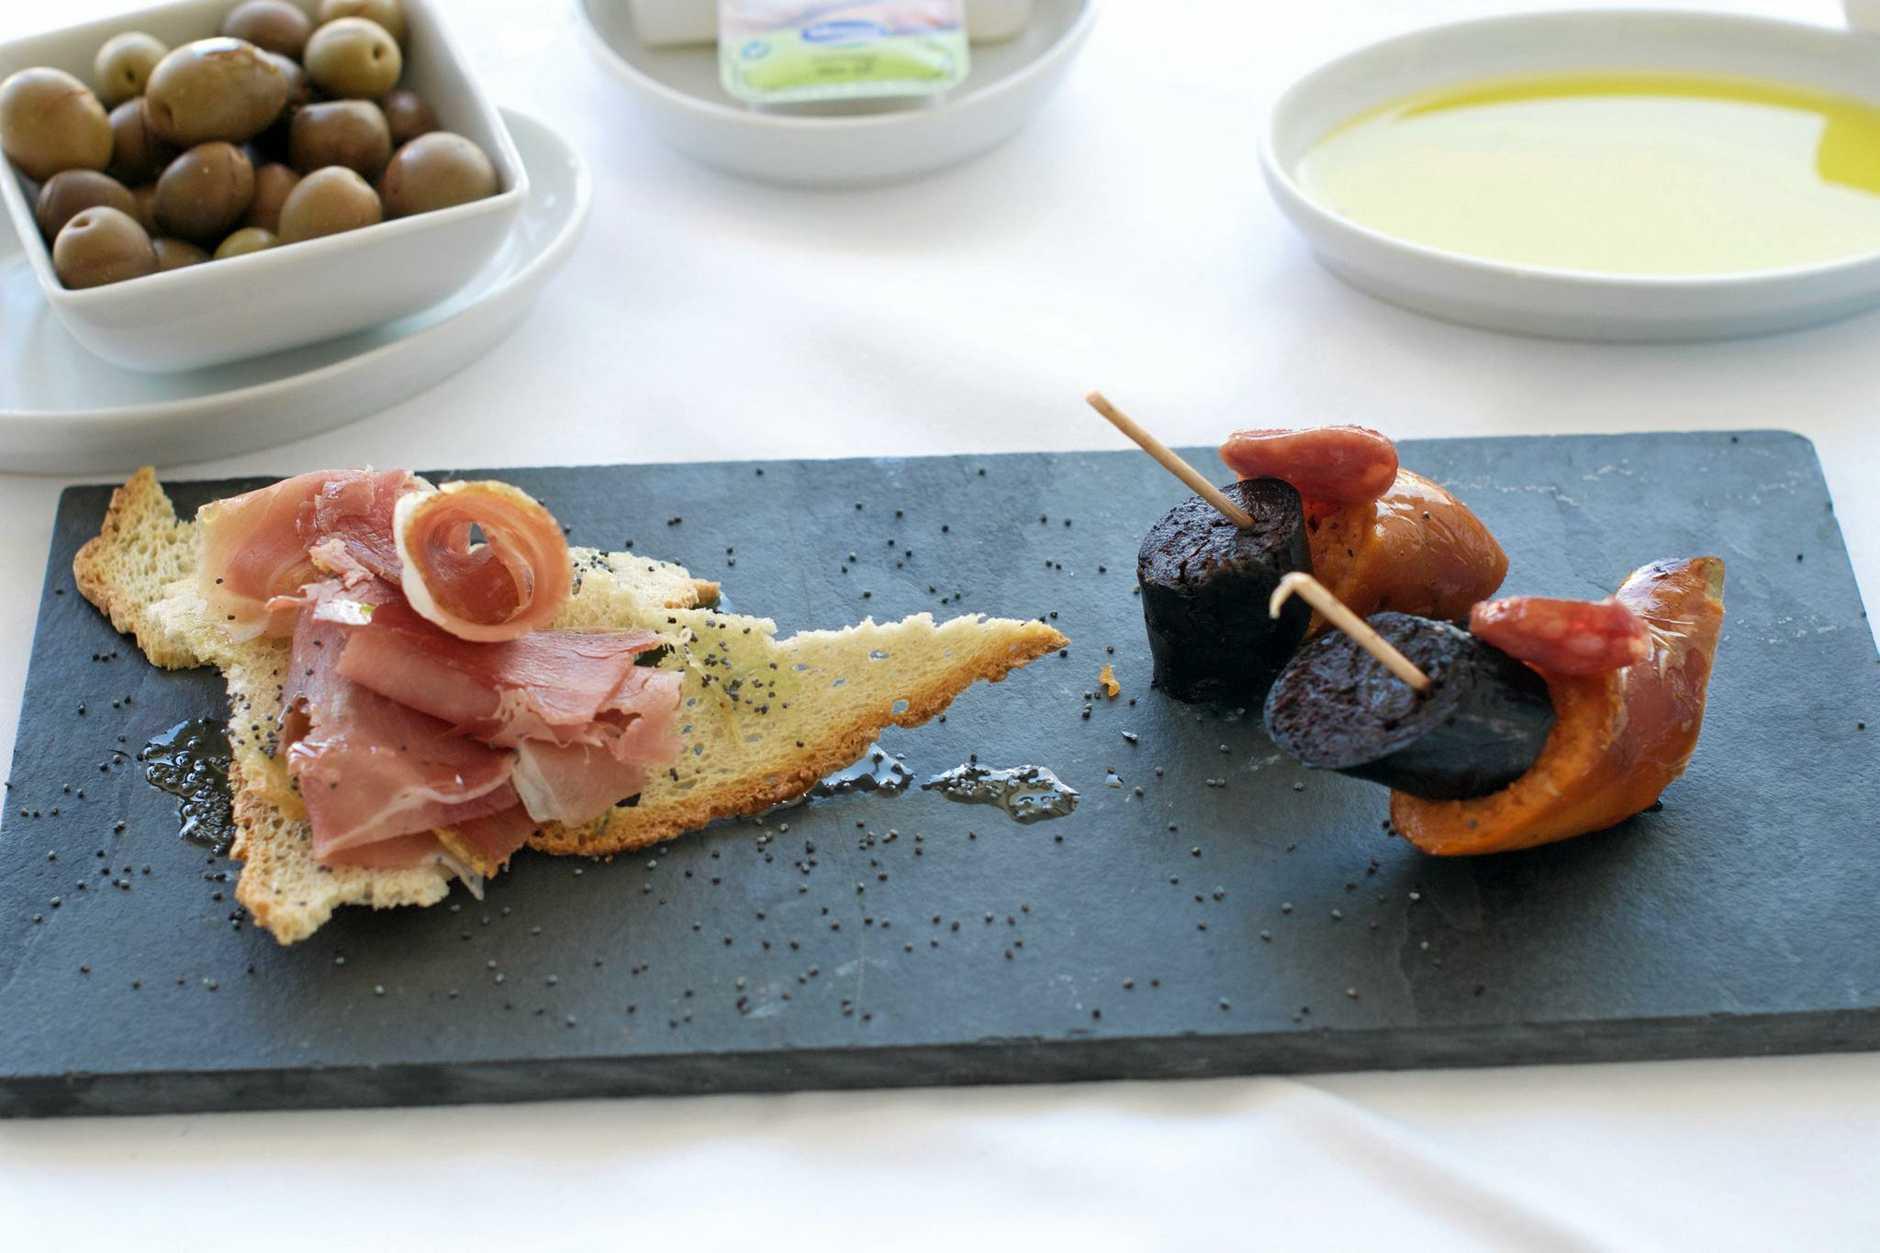 The cuisine, a Portuguese drawcard.